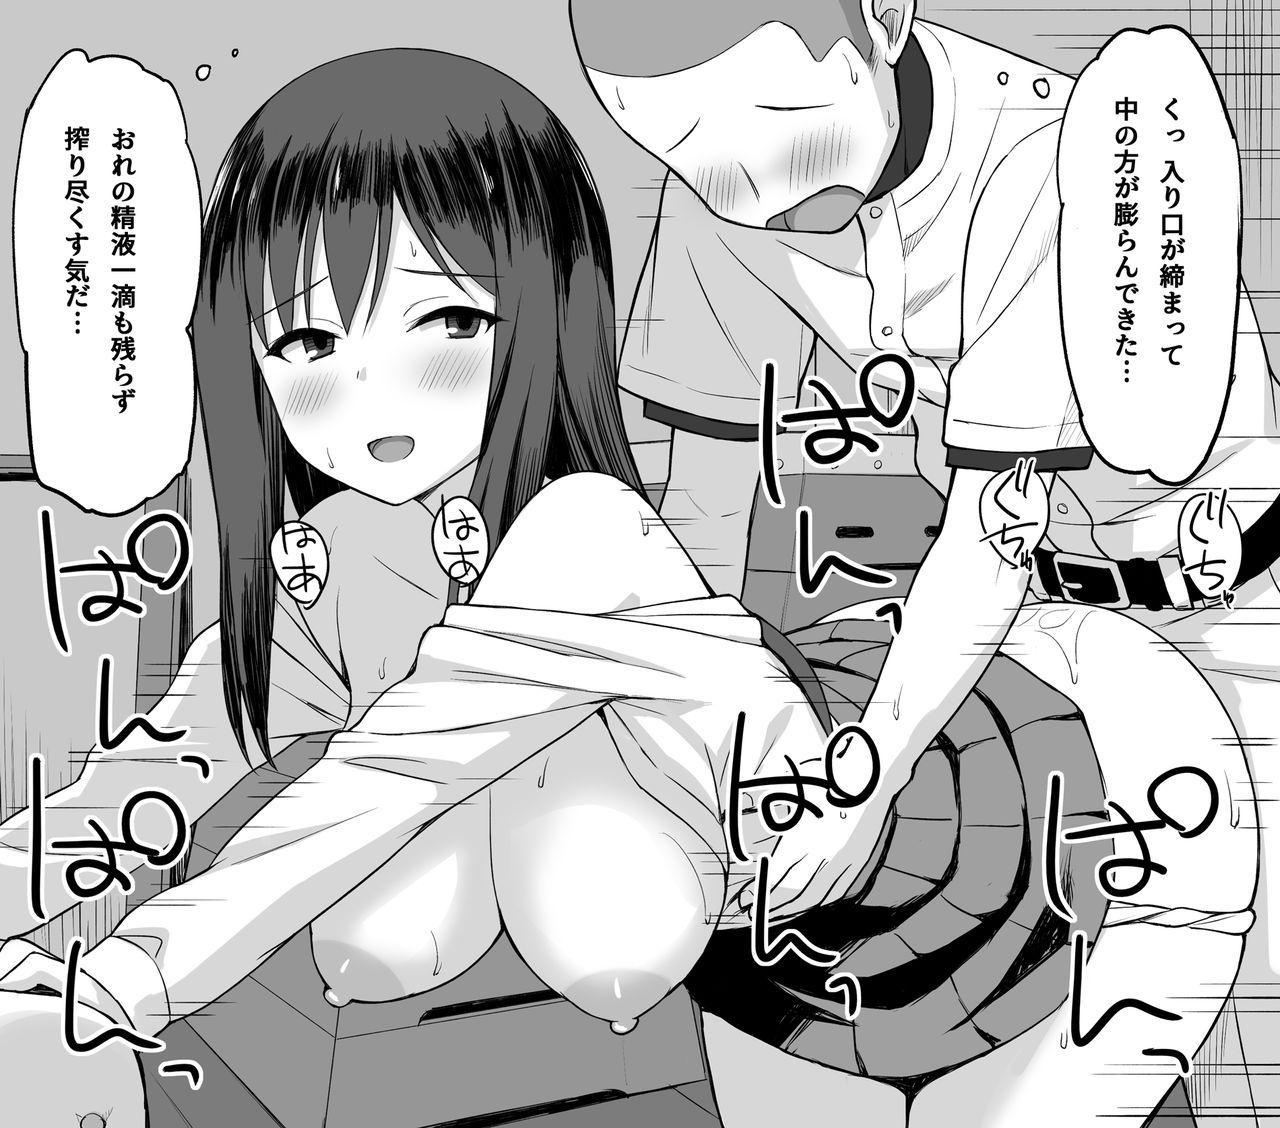 Bitch na SeFri no Tsukurikata 43